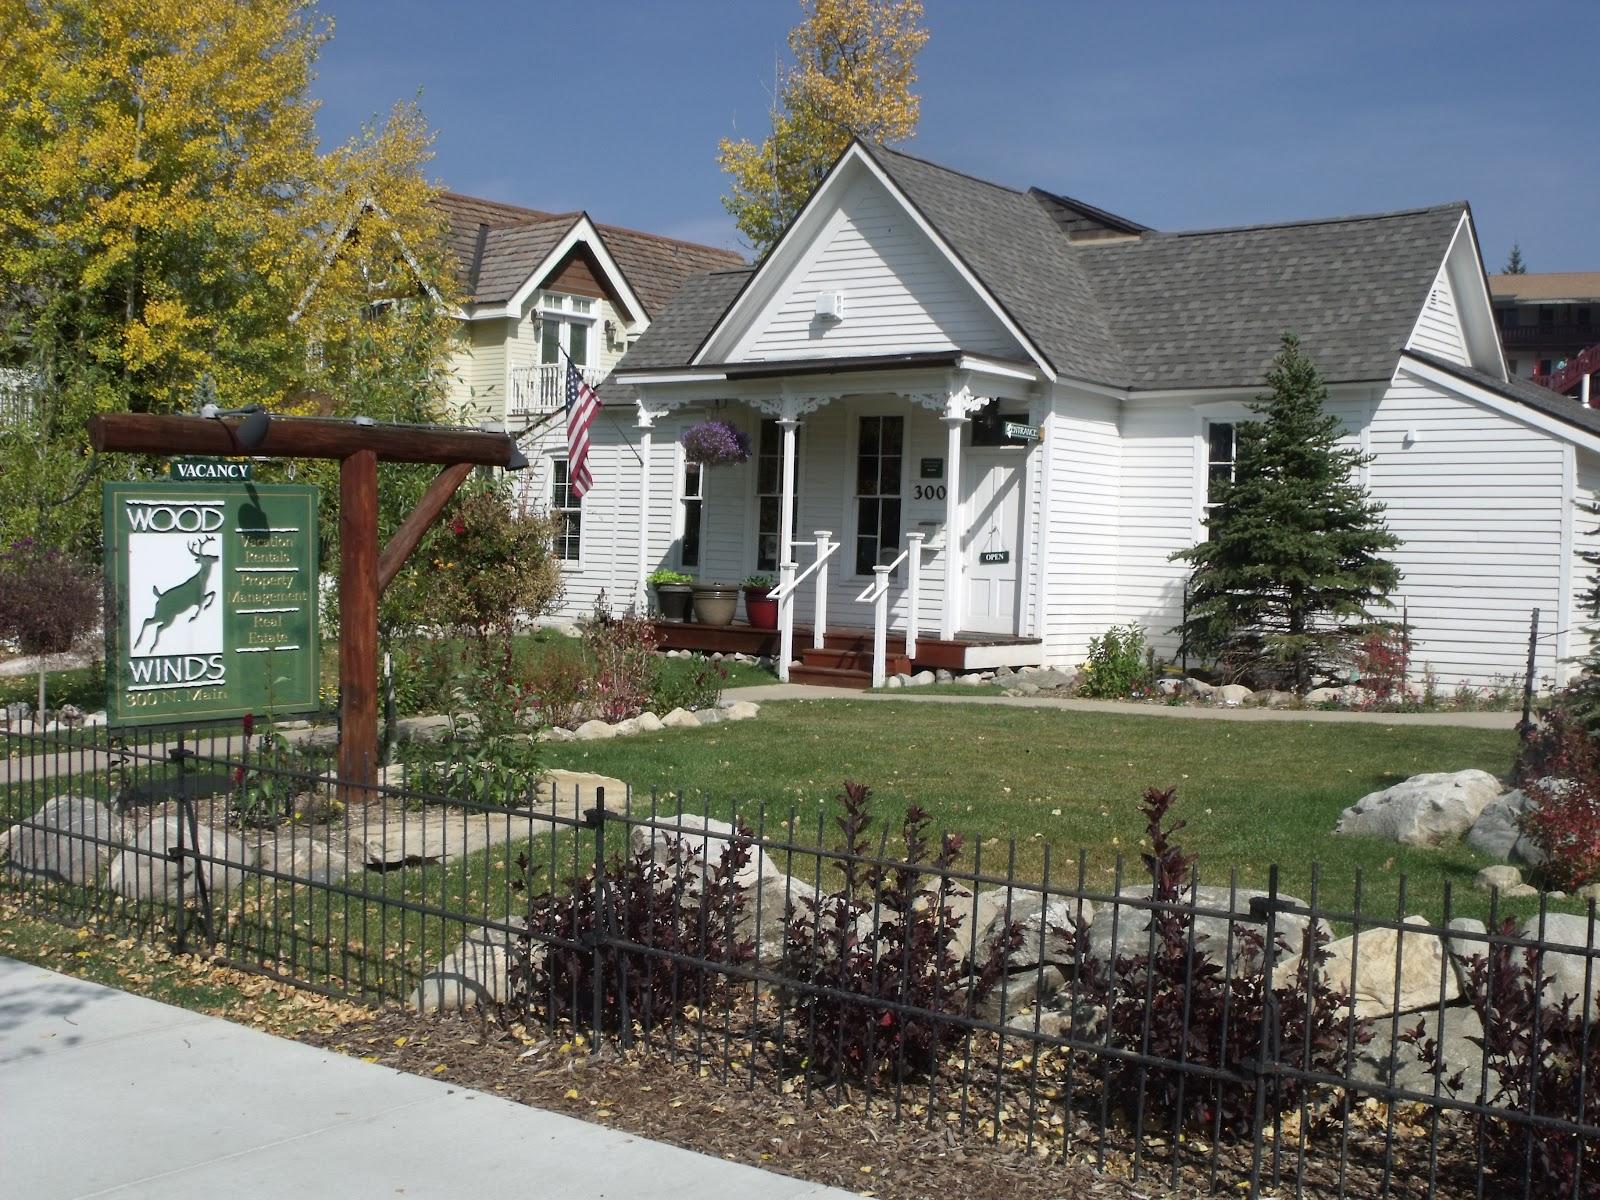 Woodwinds Property Management Breckenridge Co